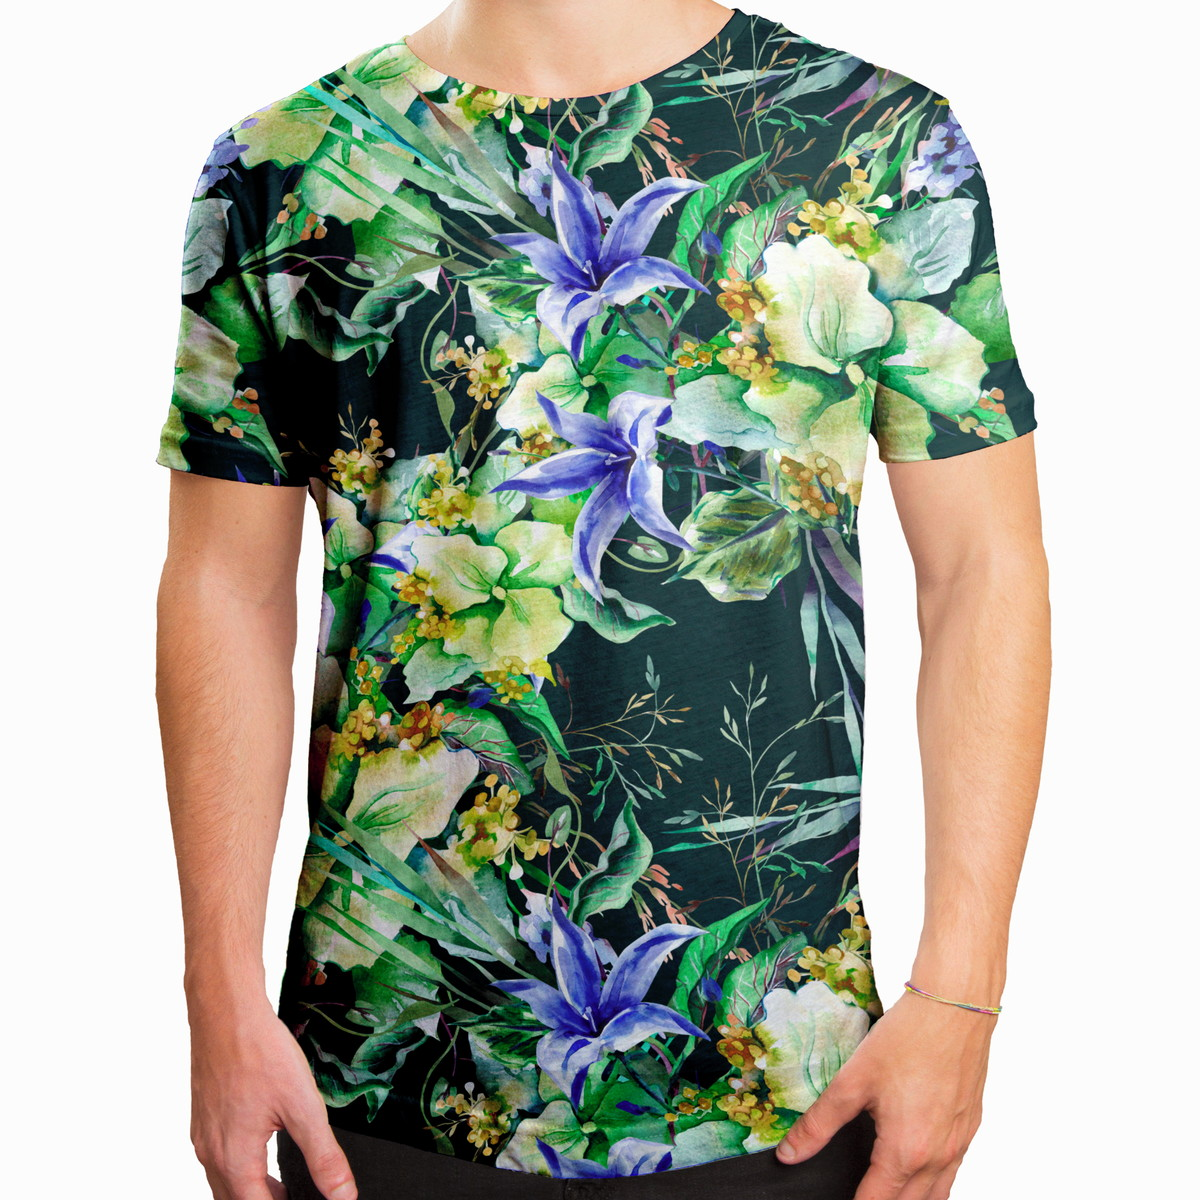 213e87d92 Camiseta Masculina Longline Swag Jardim De Campânula no Elo7